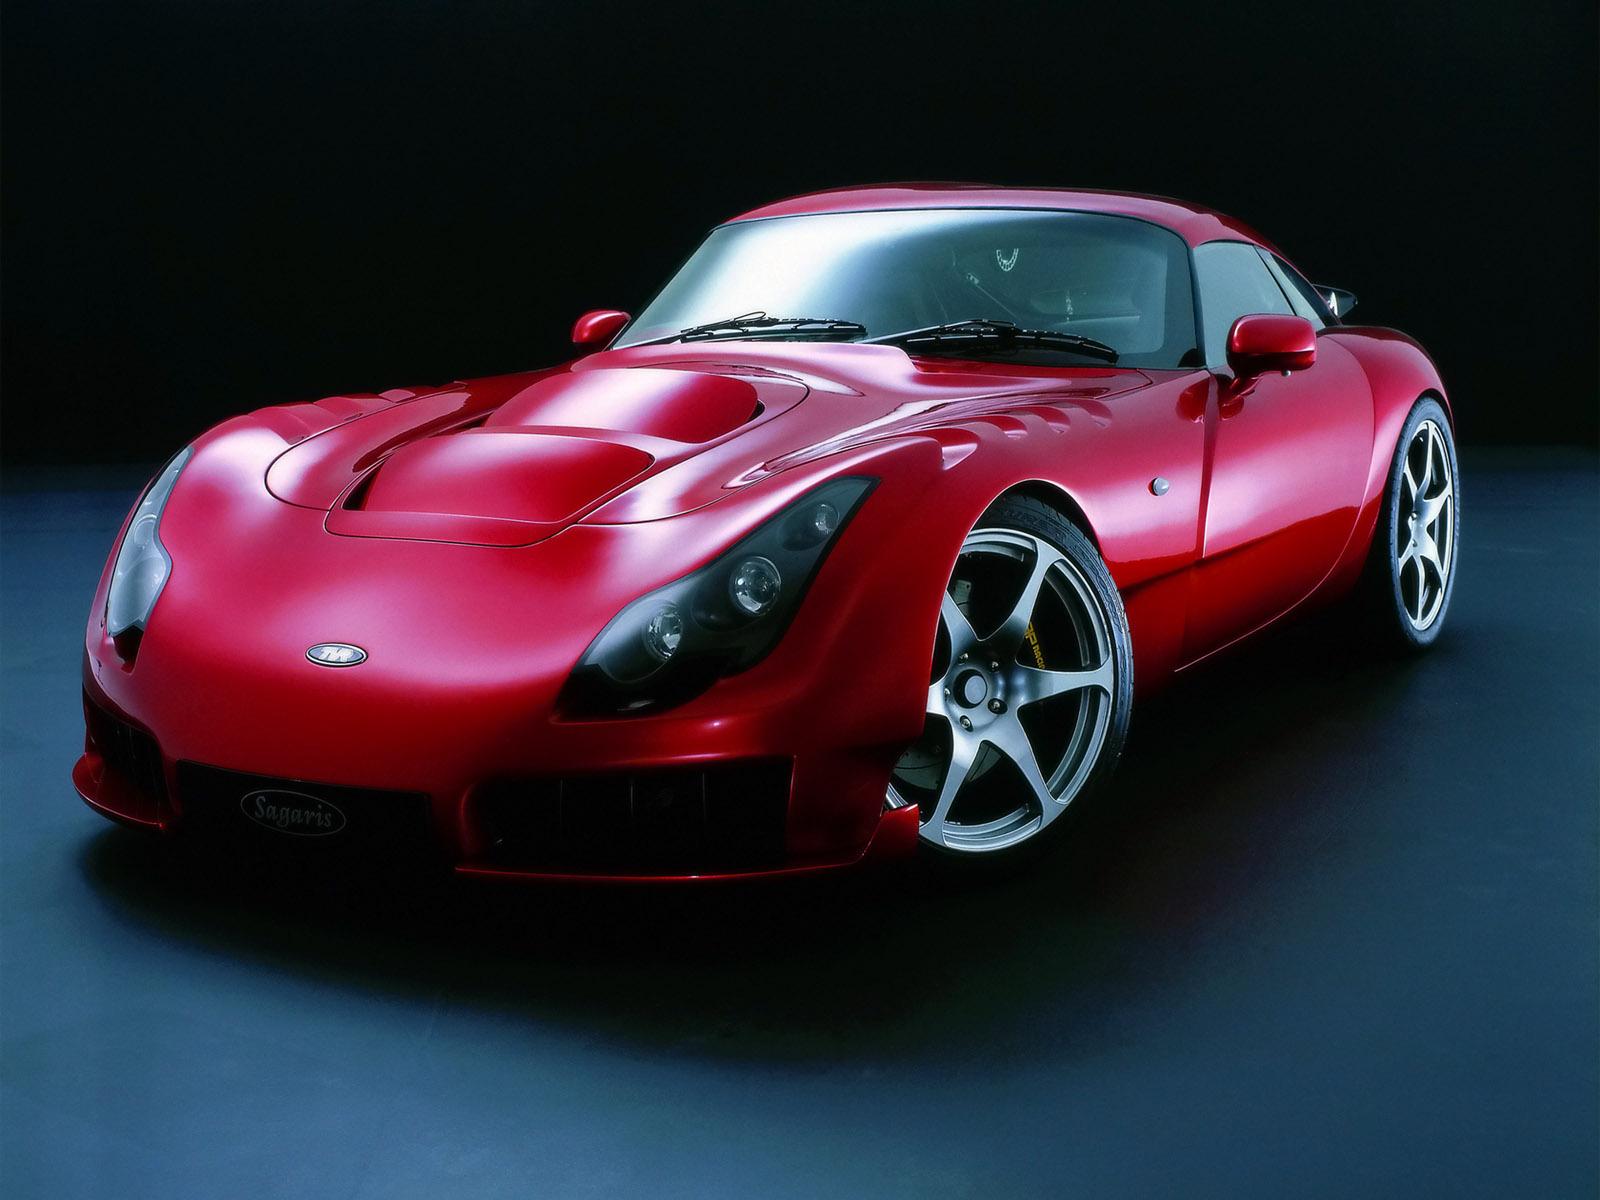 Wallpapers of beautiful cars: - 205.5KB